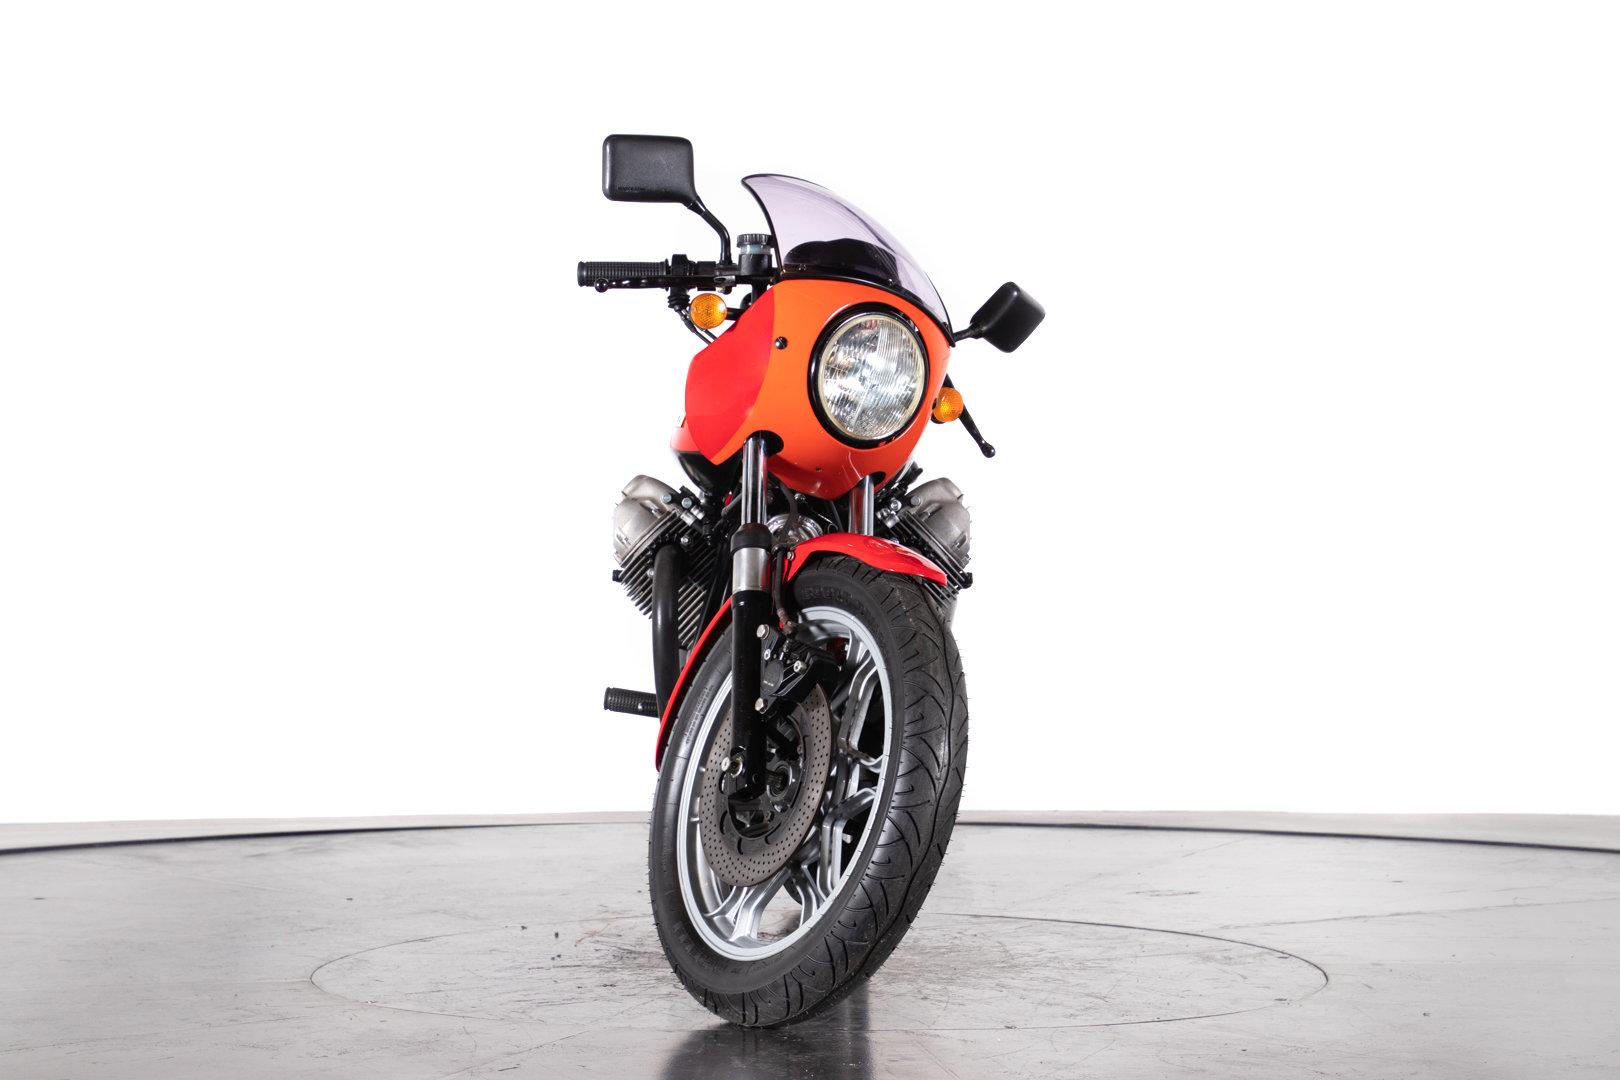 MOTO GUZZI - 850 LE MANS - 1977 For Sale (picture 3 of 6)